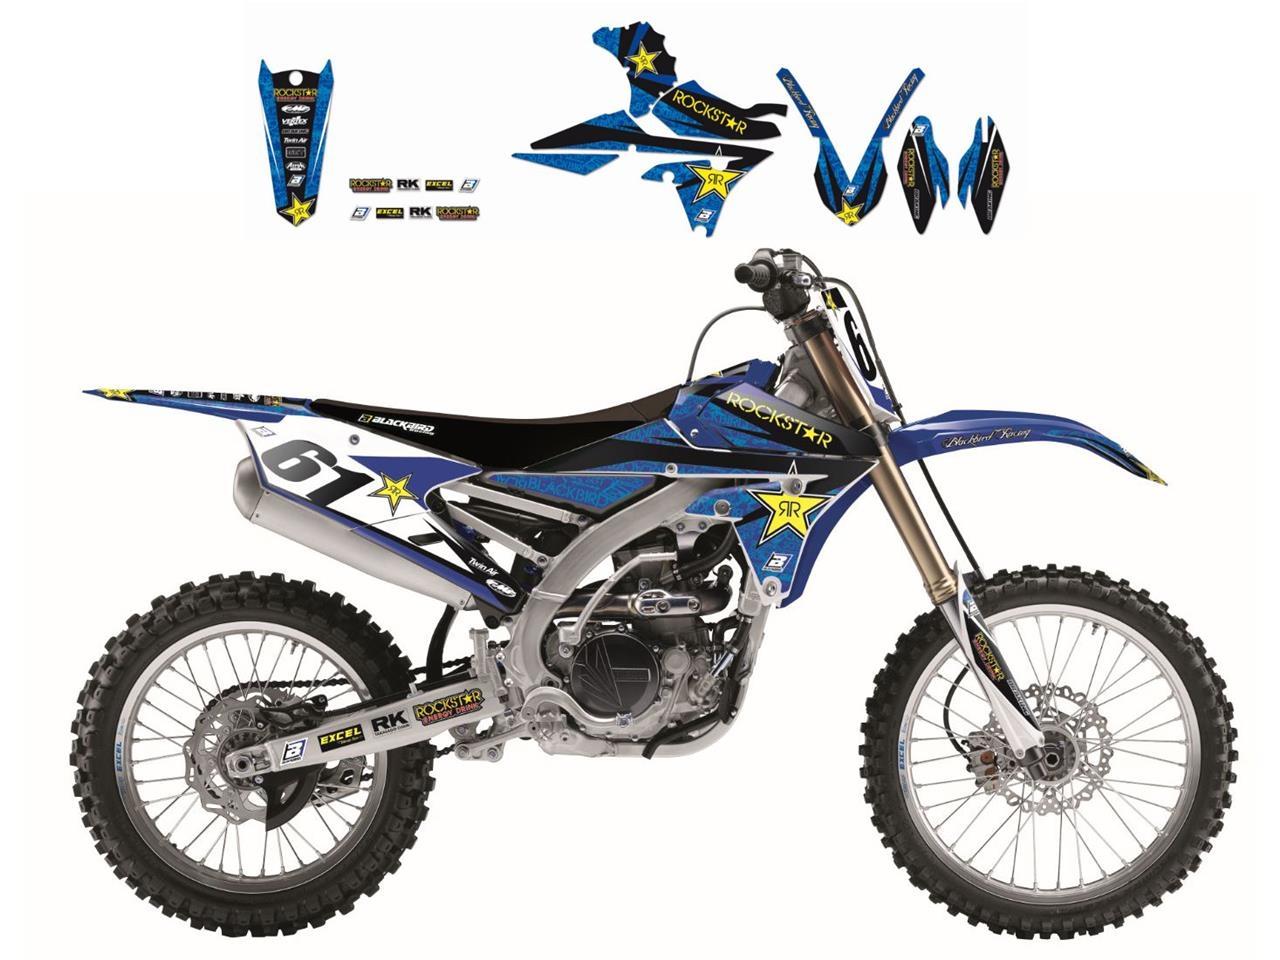 Kit déco Blackbird Rockstar Energy Yamaha 250 YZ 15-18